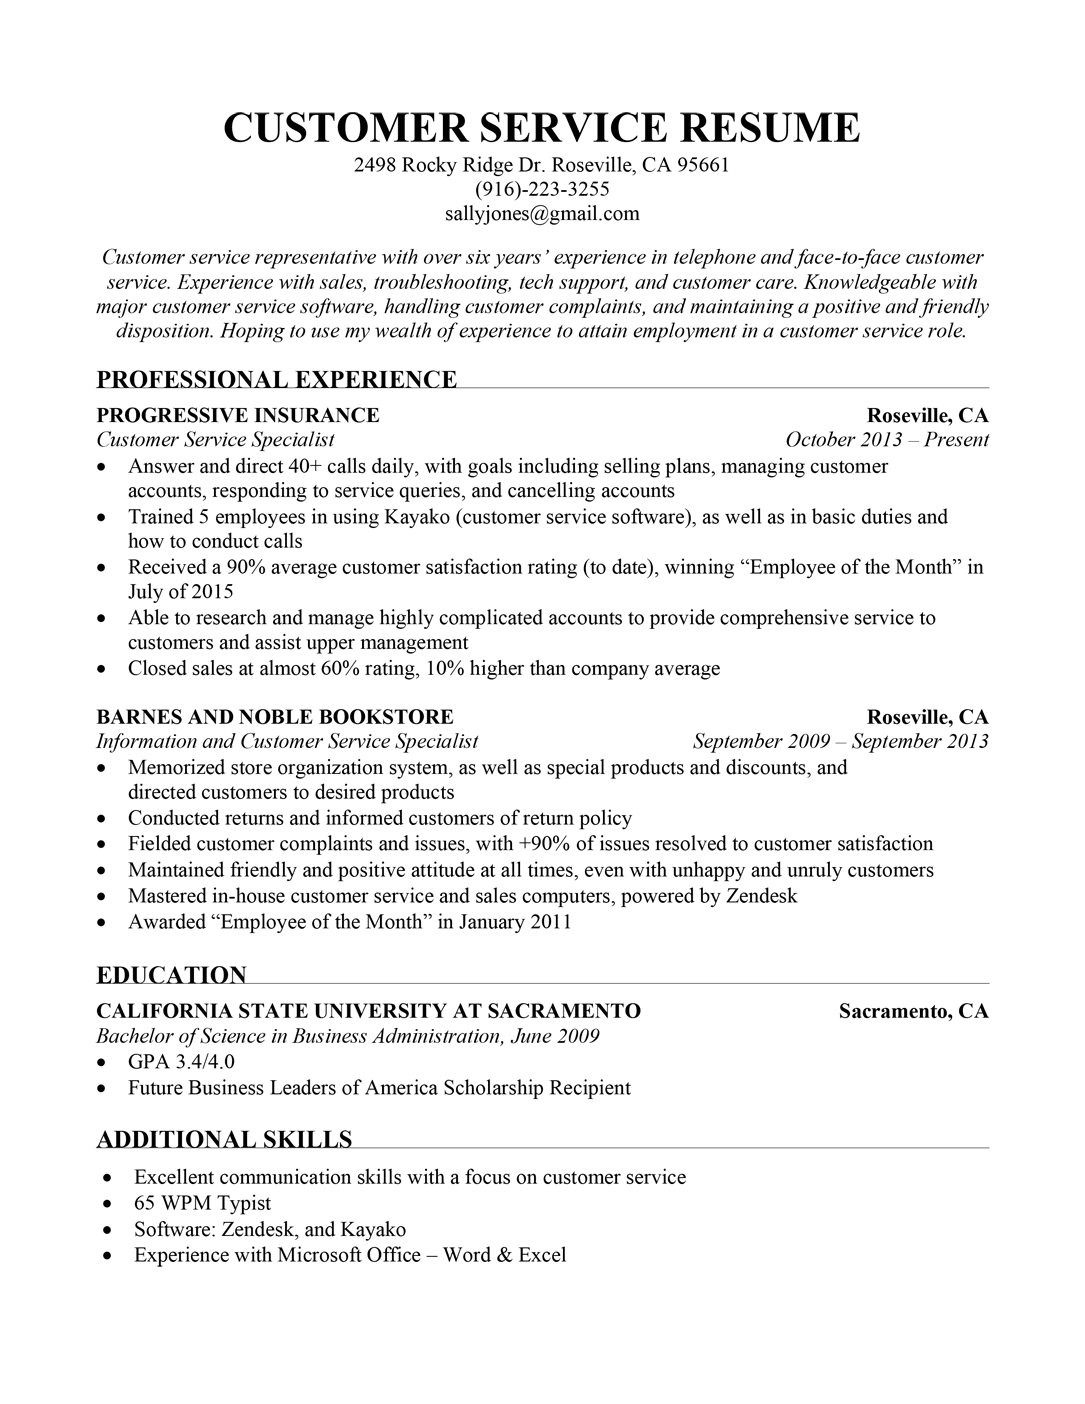 Customer Service Resume Sample Resume Companion in 2020